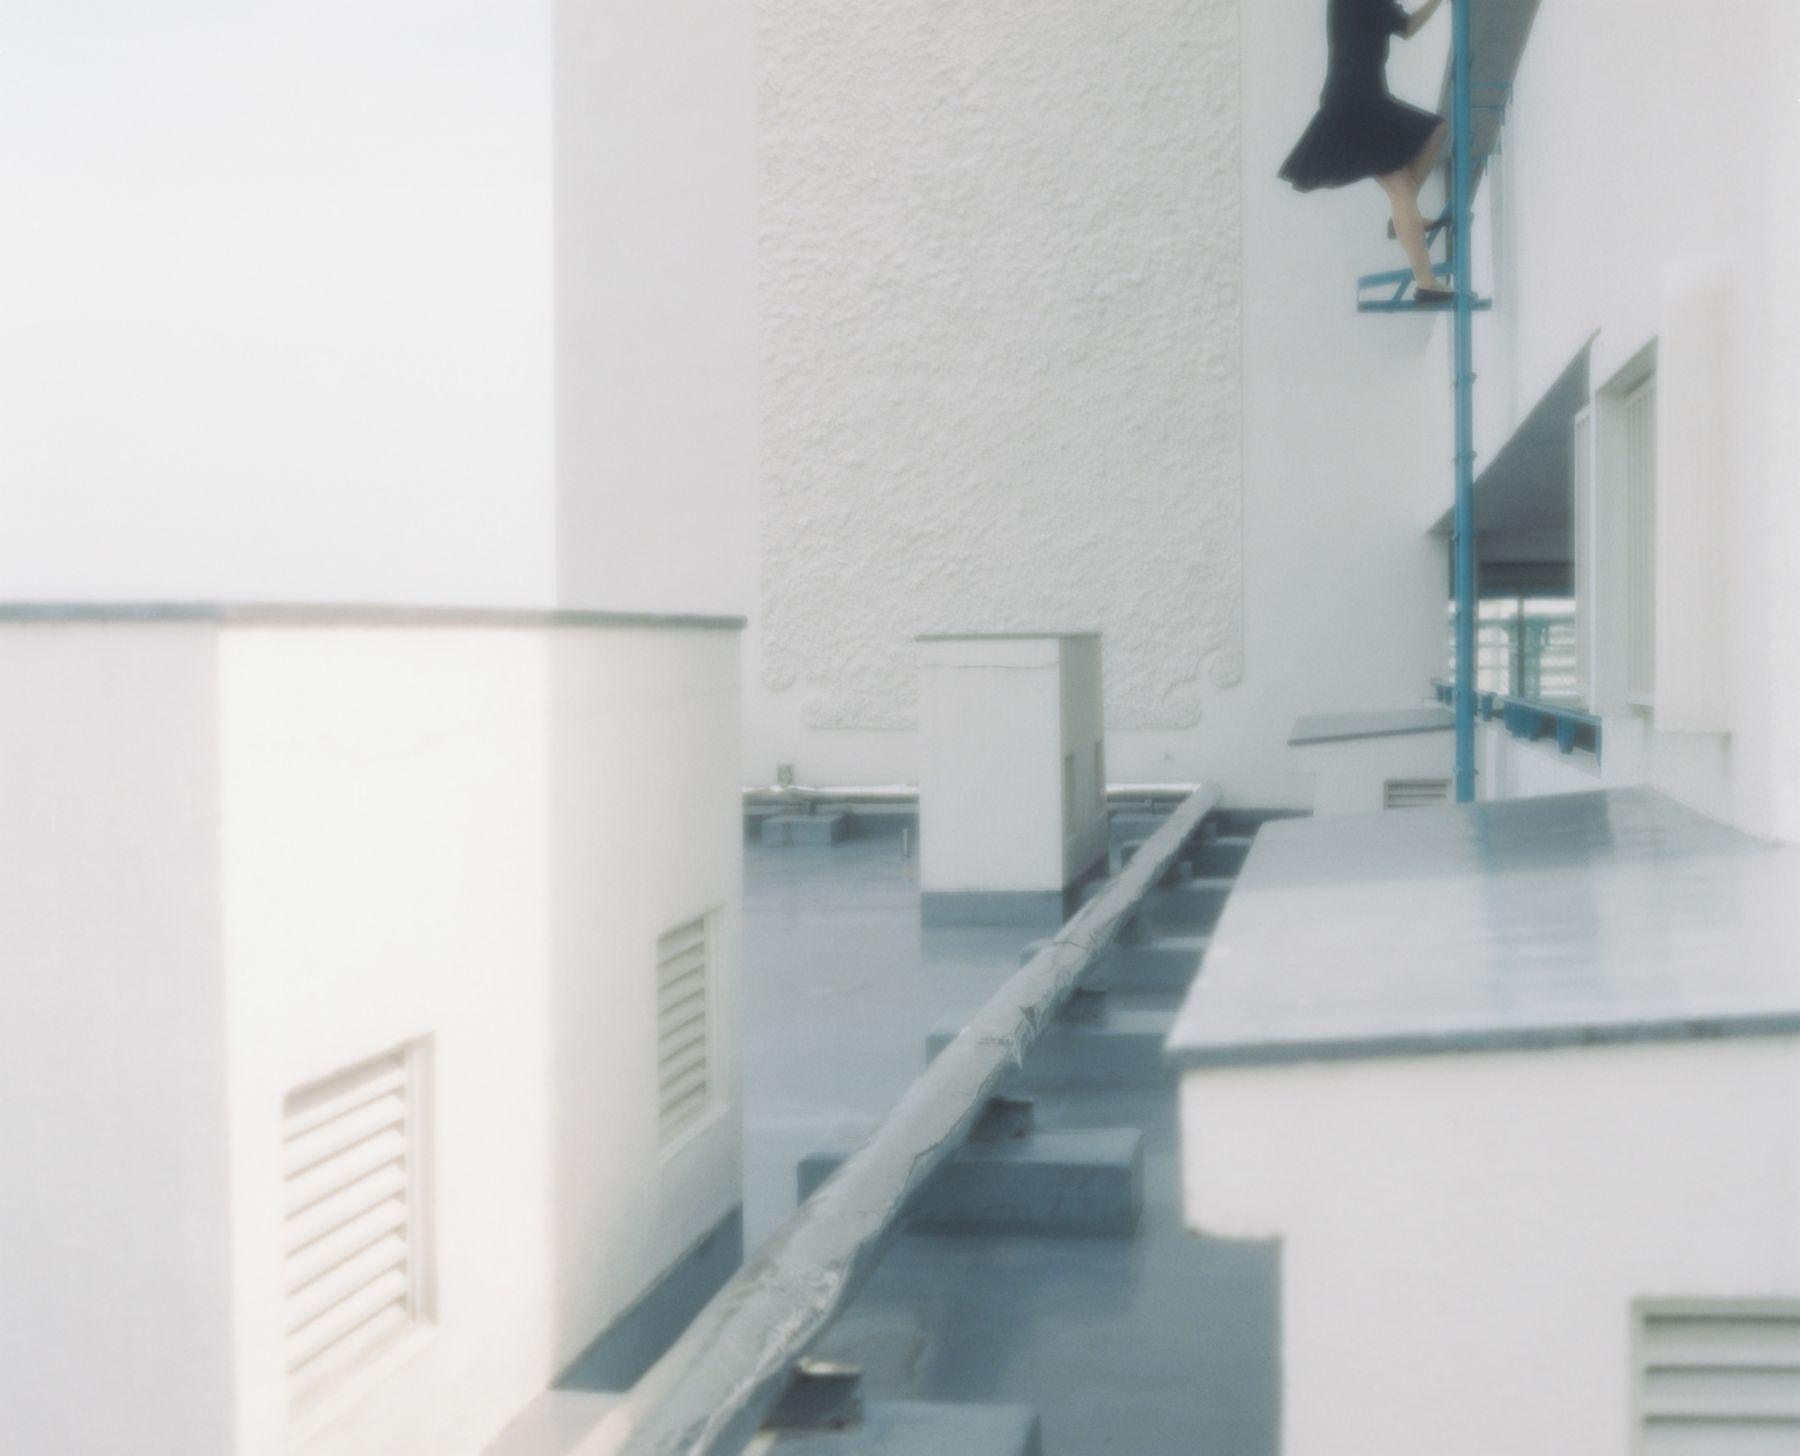 Haruna Kawanishi, Call Sign, Call sign #14, 2009, Sous Les Etoiles Gallery